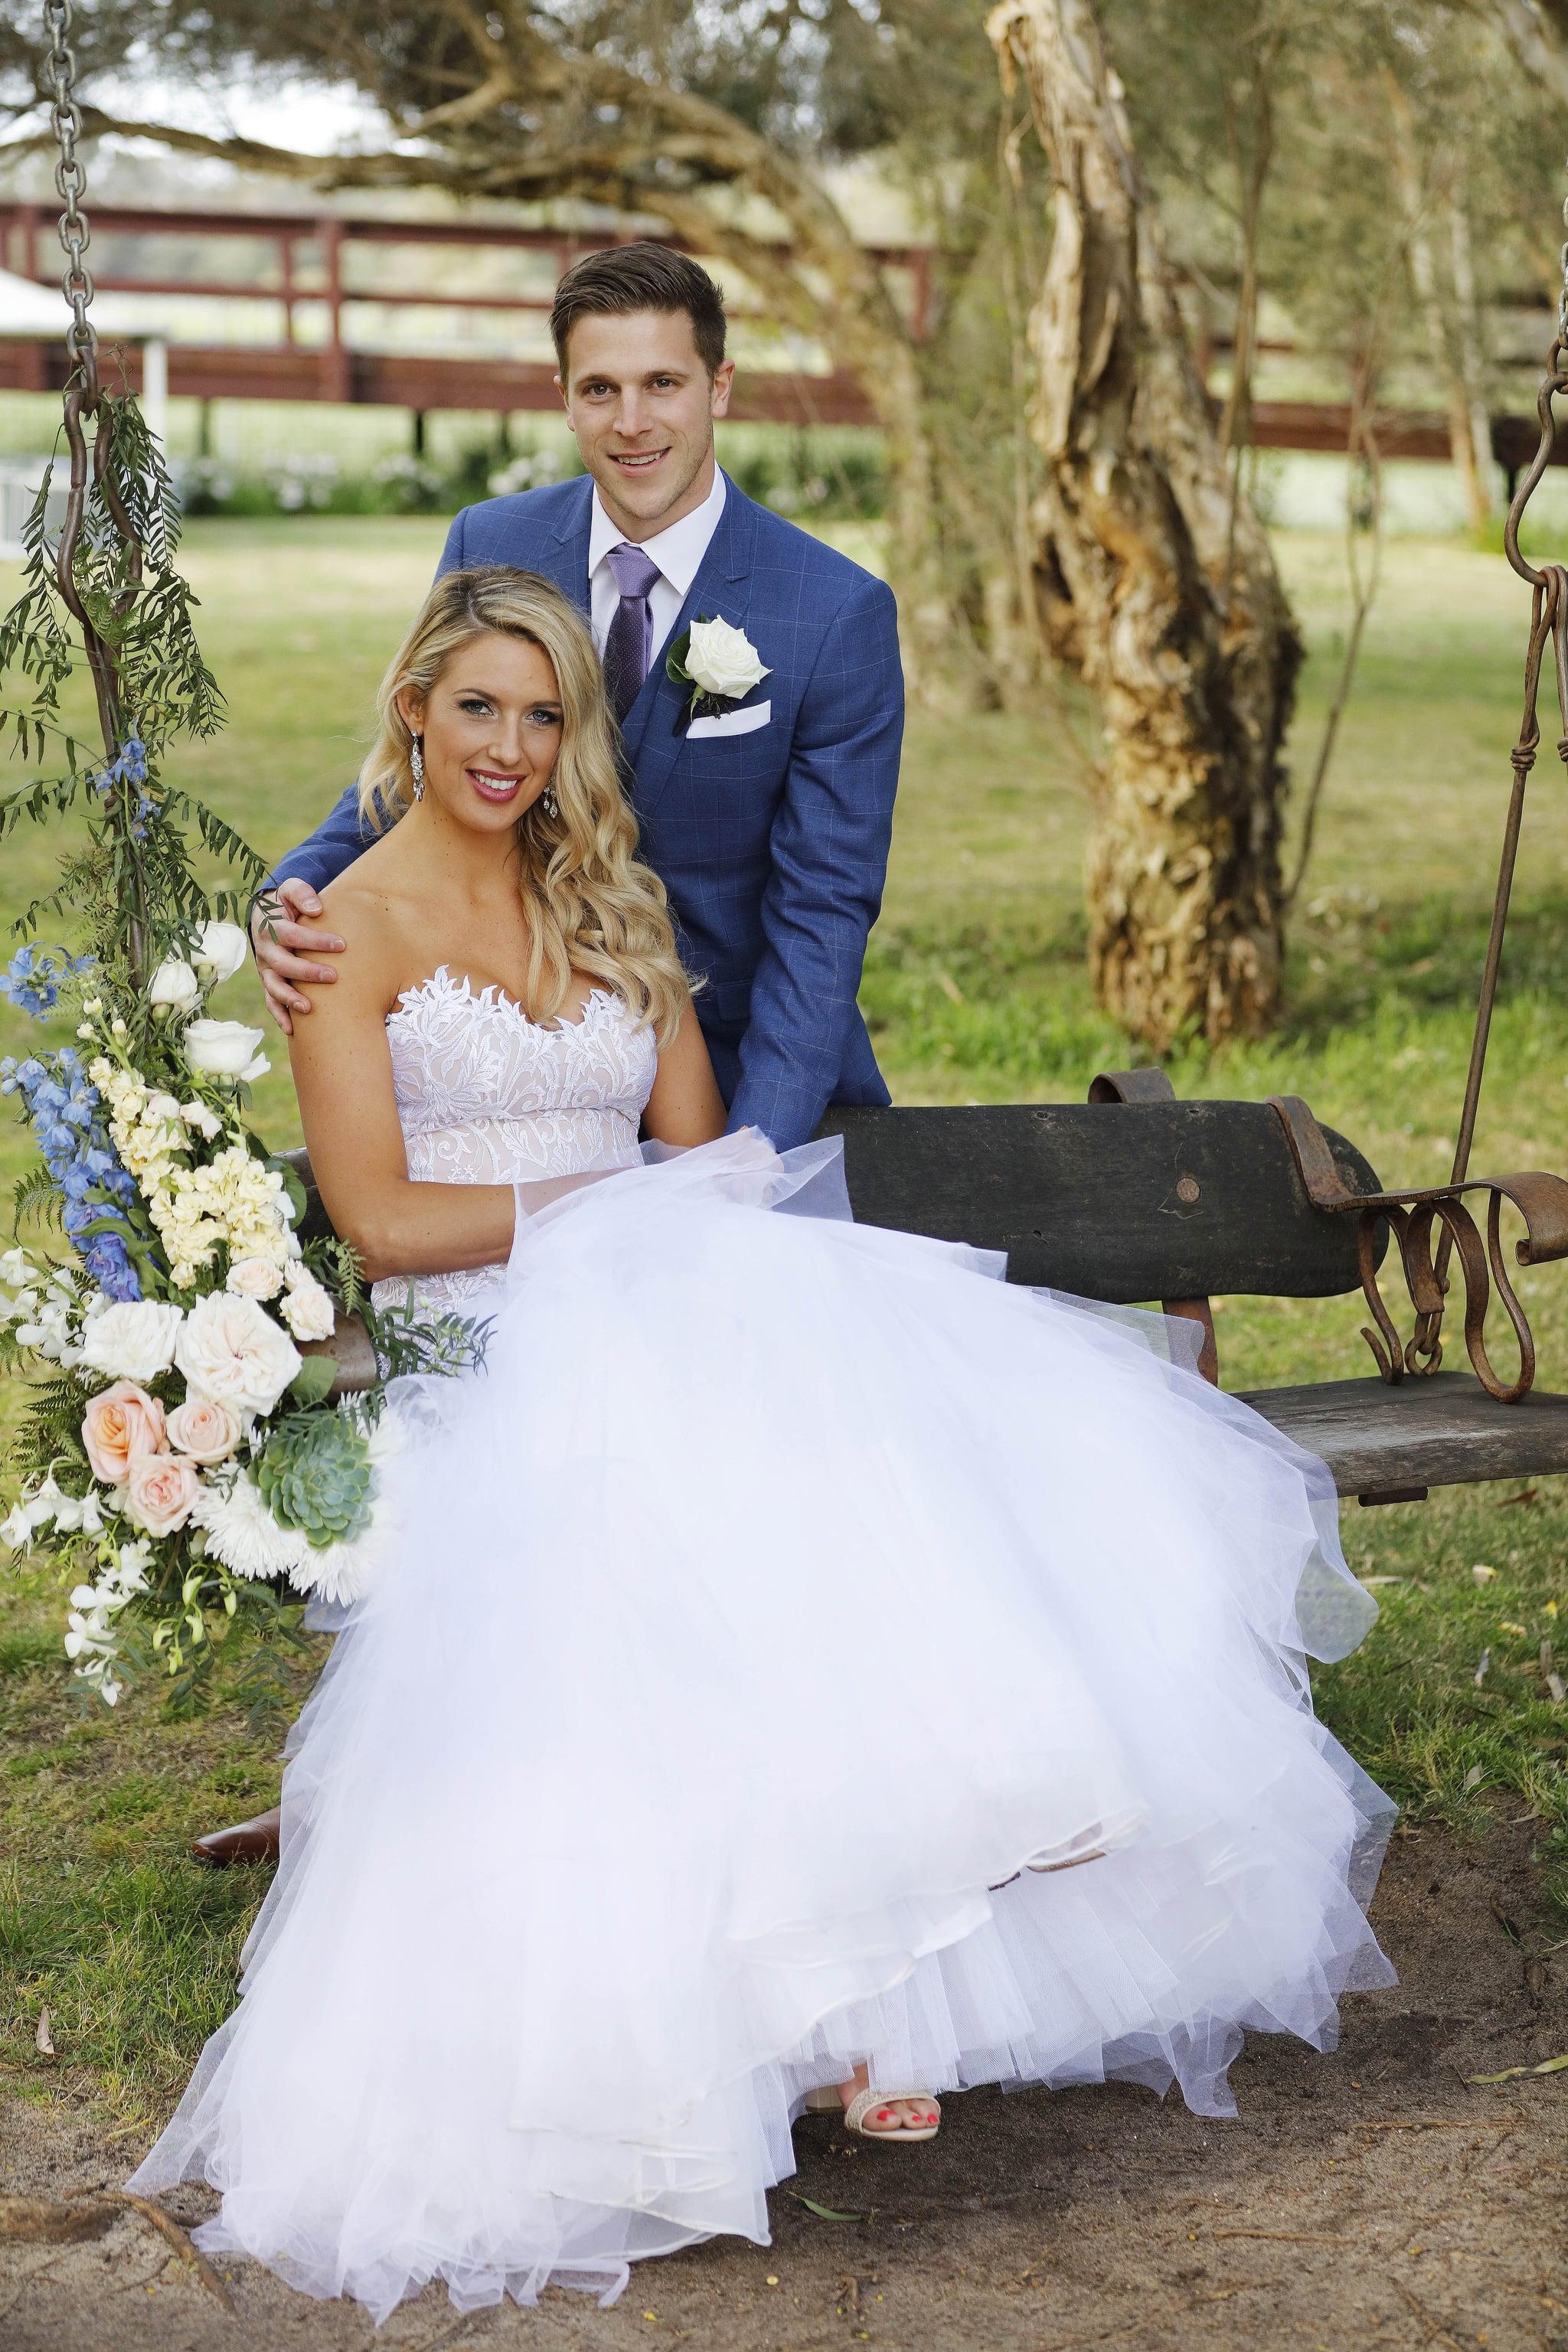 Married Sight 2017 Call Guys Short Popsugar Celebrity Australia